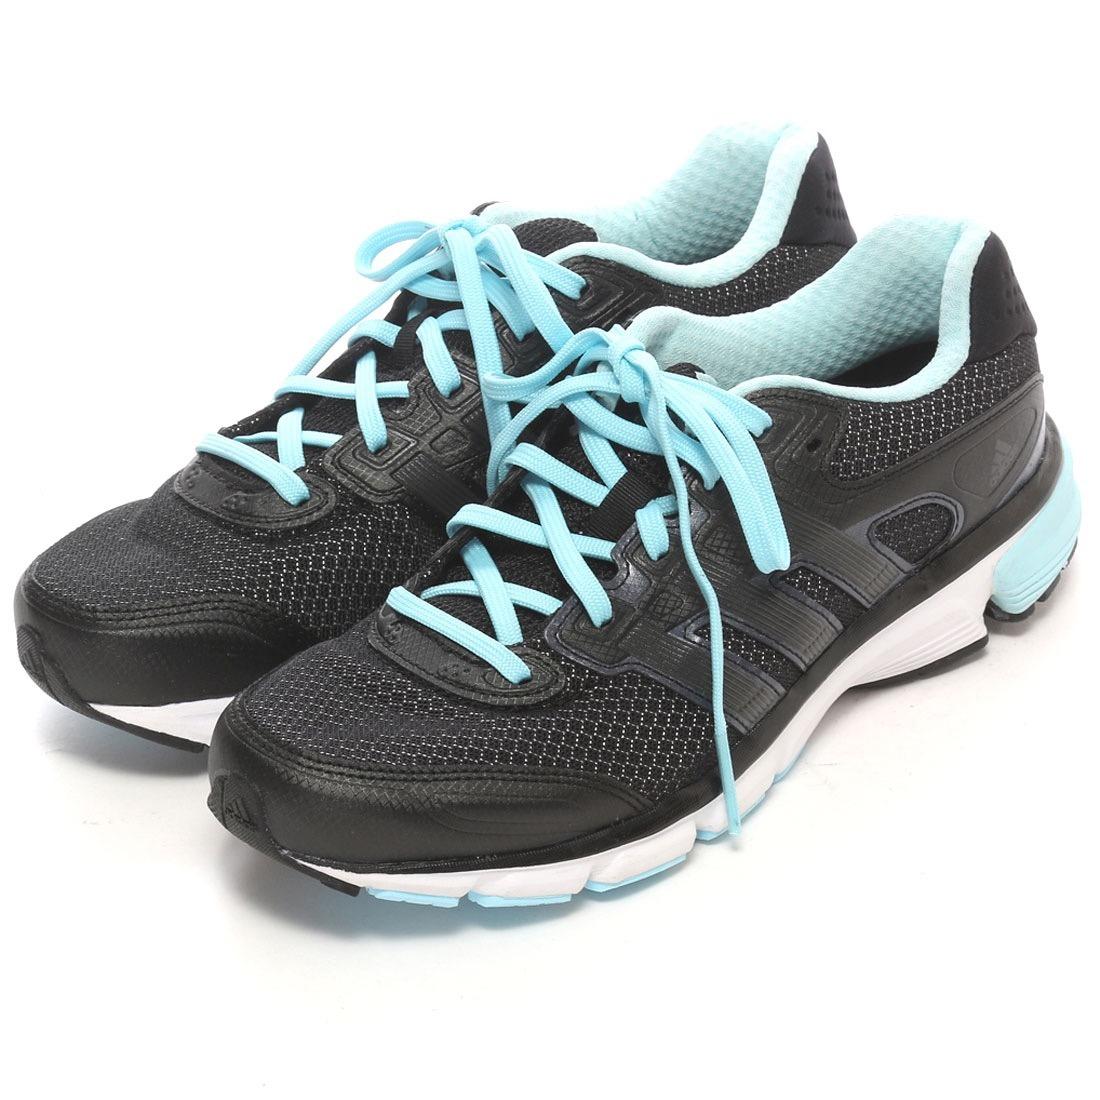 63cdf5ea0b Zapatillas adidas Mujer Running Nova Cushion - $ 1.490,00 en Mercado ...